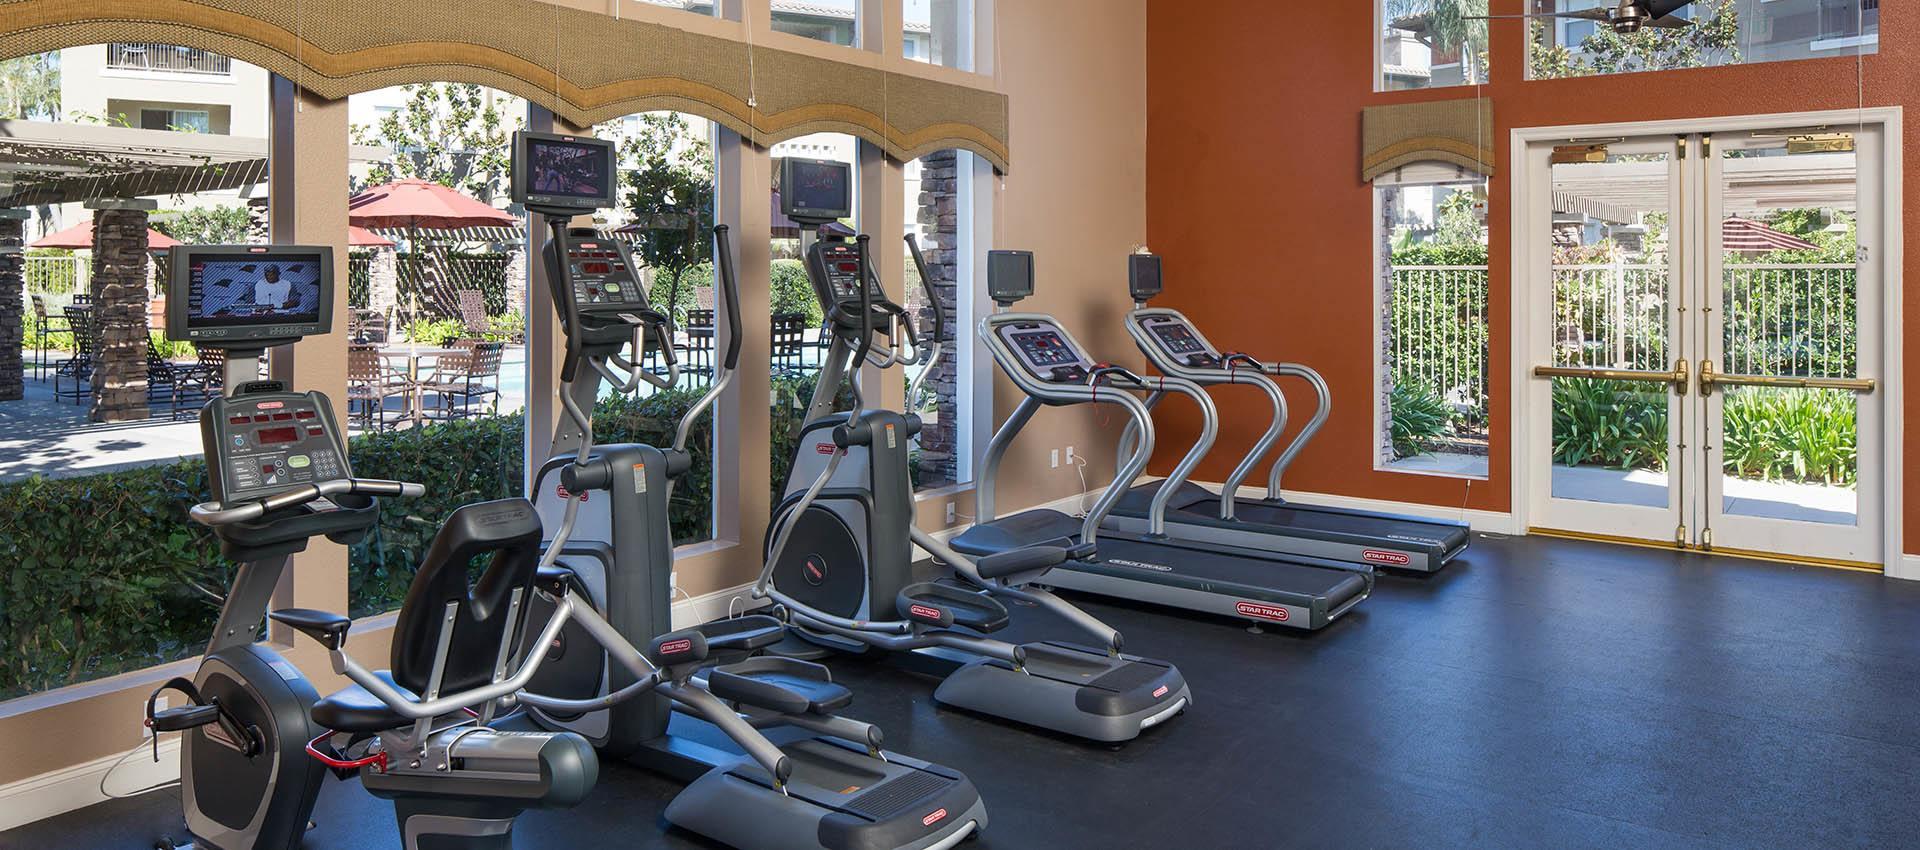 24 Hour Fitness Center Amenities Gallery